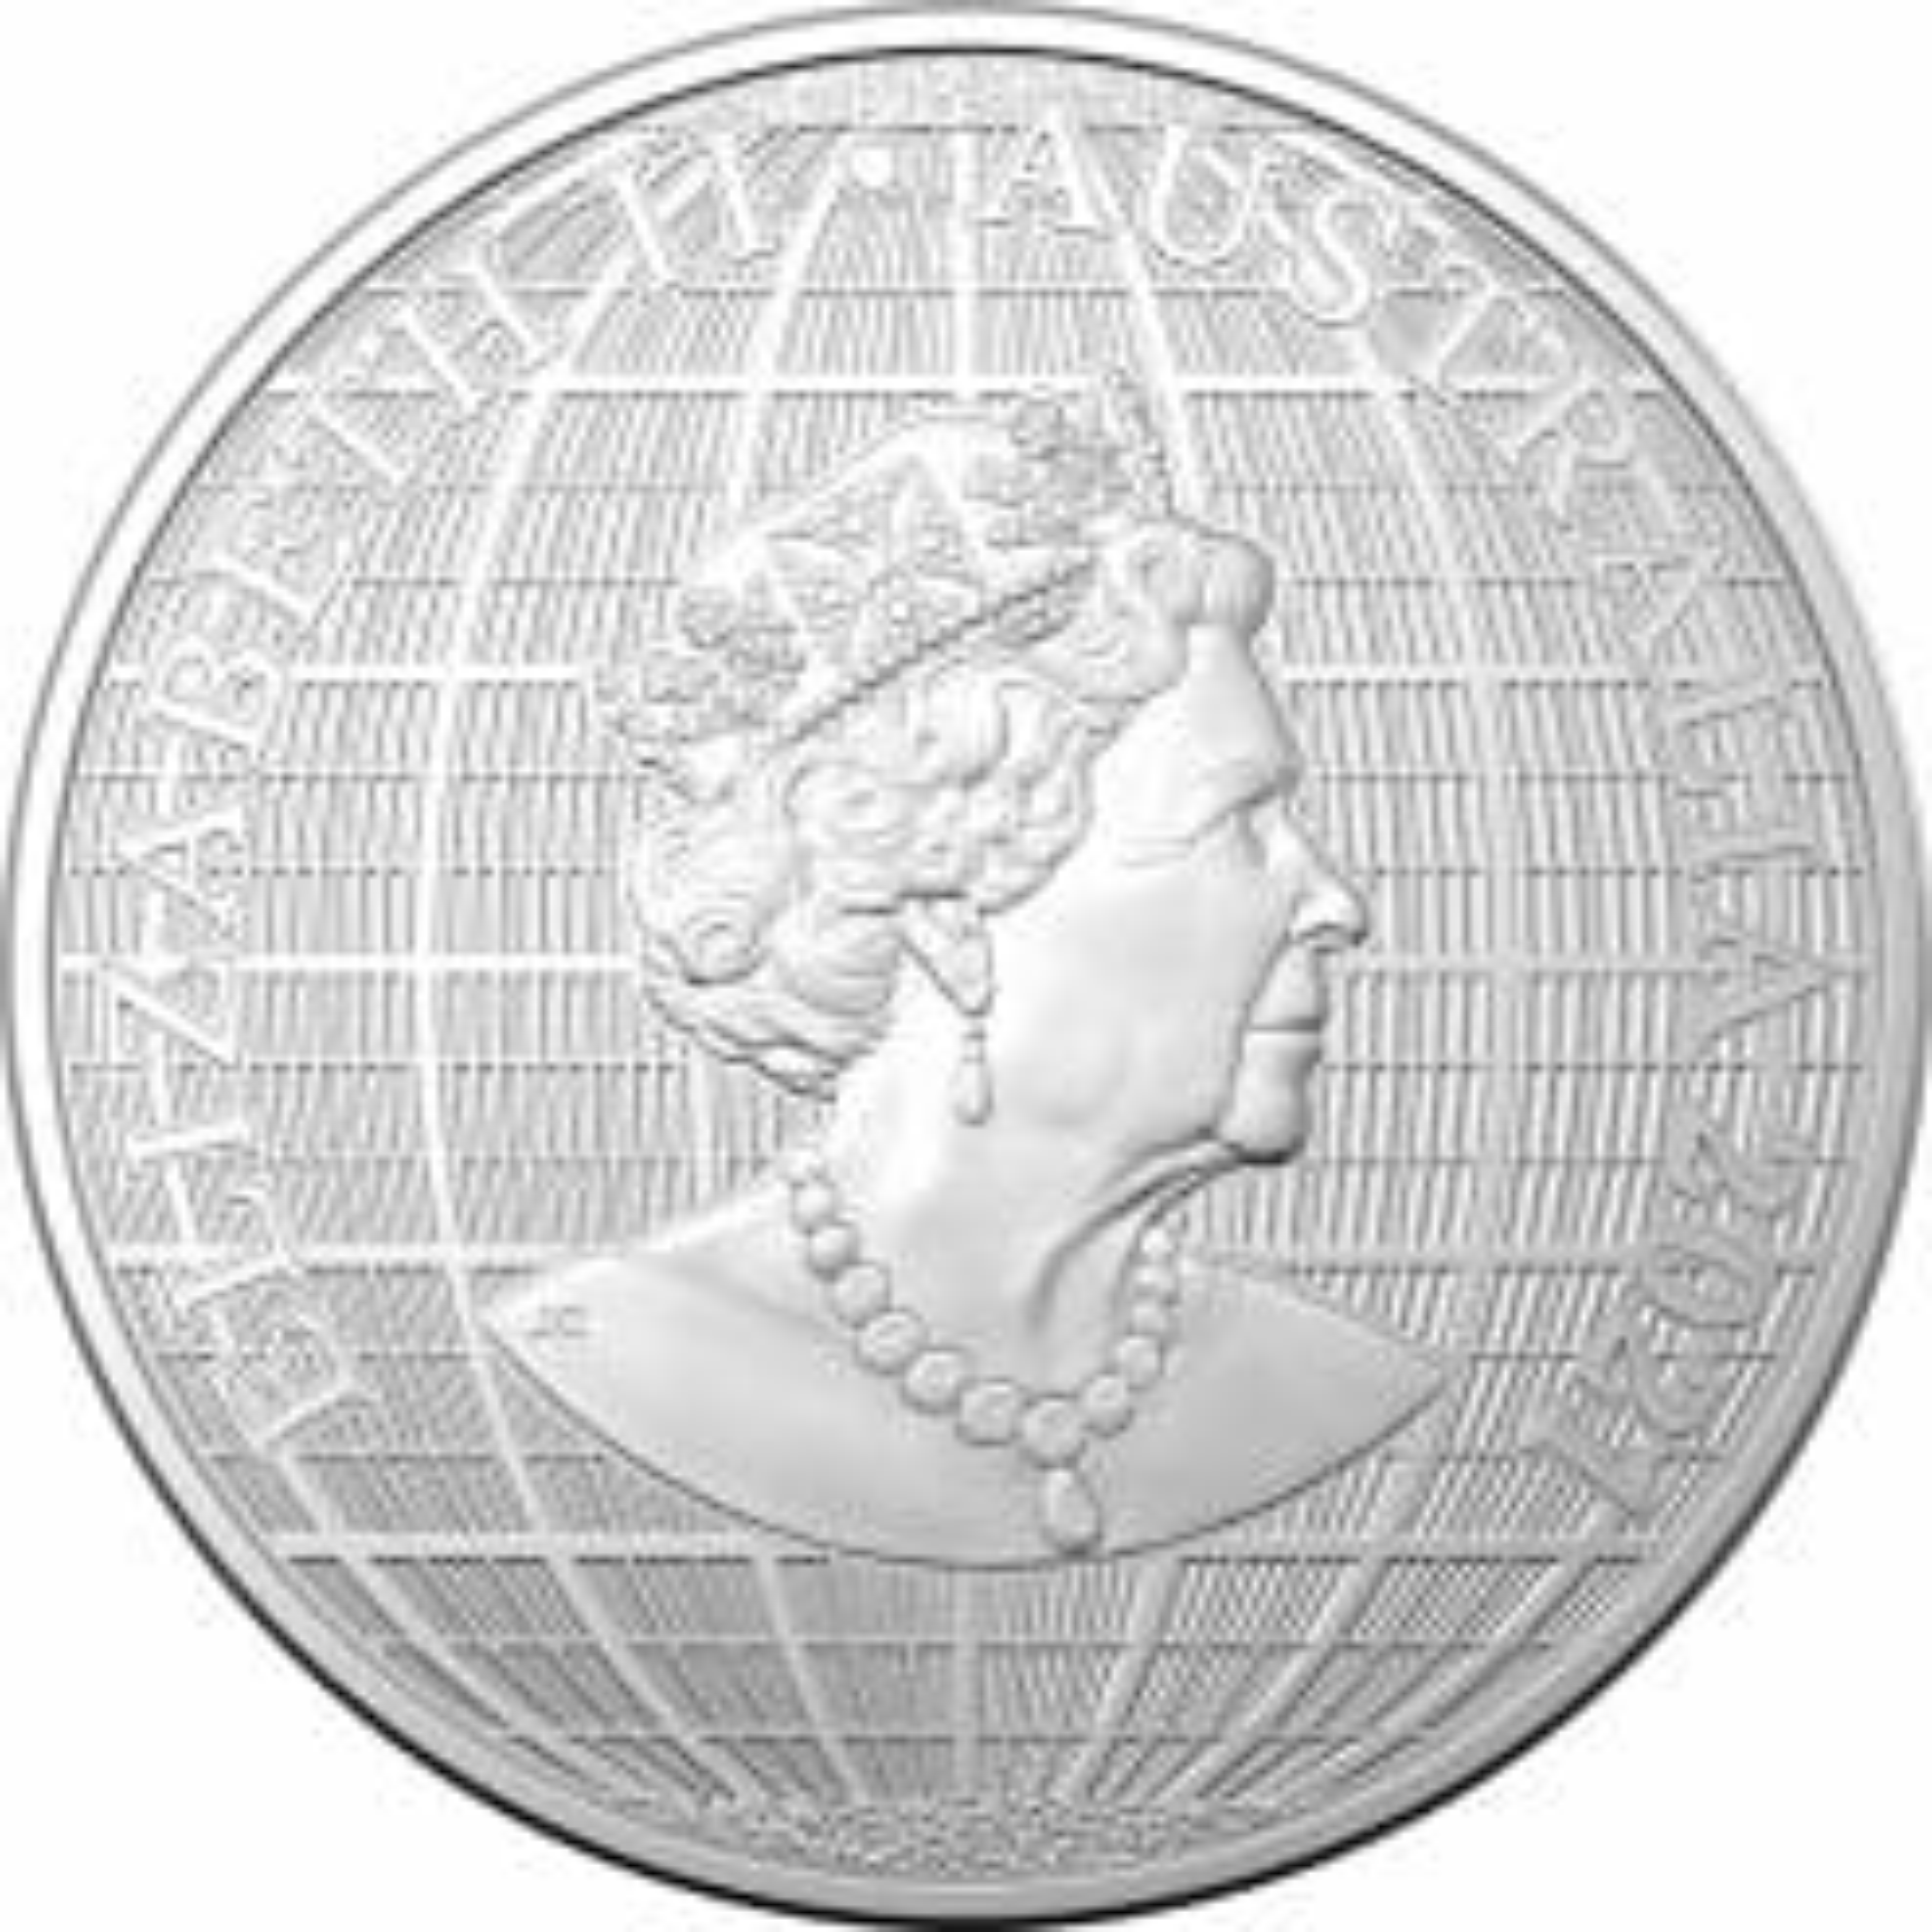 2021 $1 Beneath the Southern Skies 1oz .9999 Silver Bullion Coin - Platypus 6